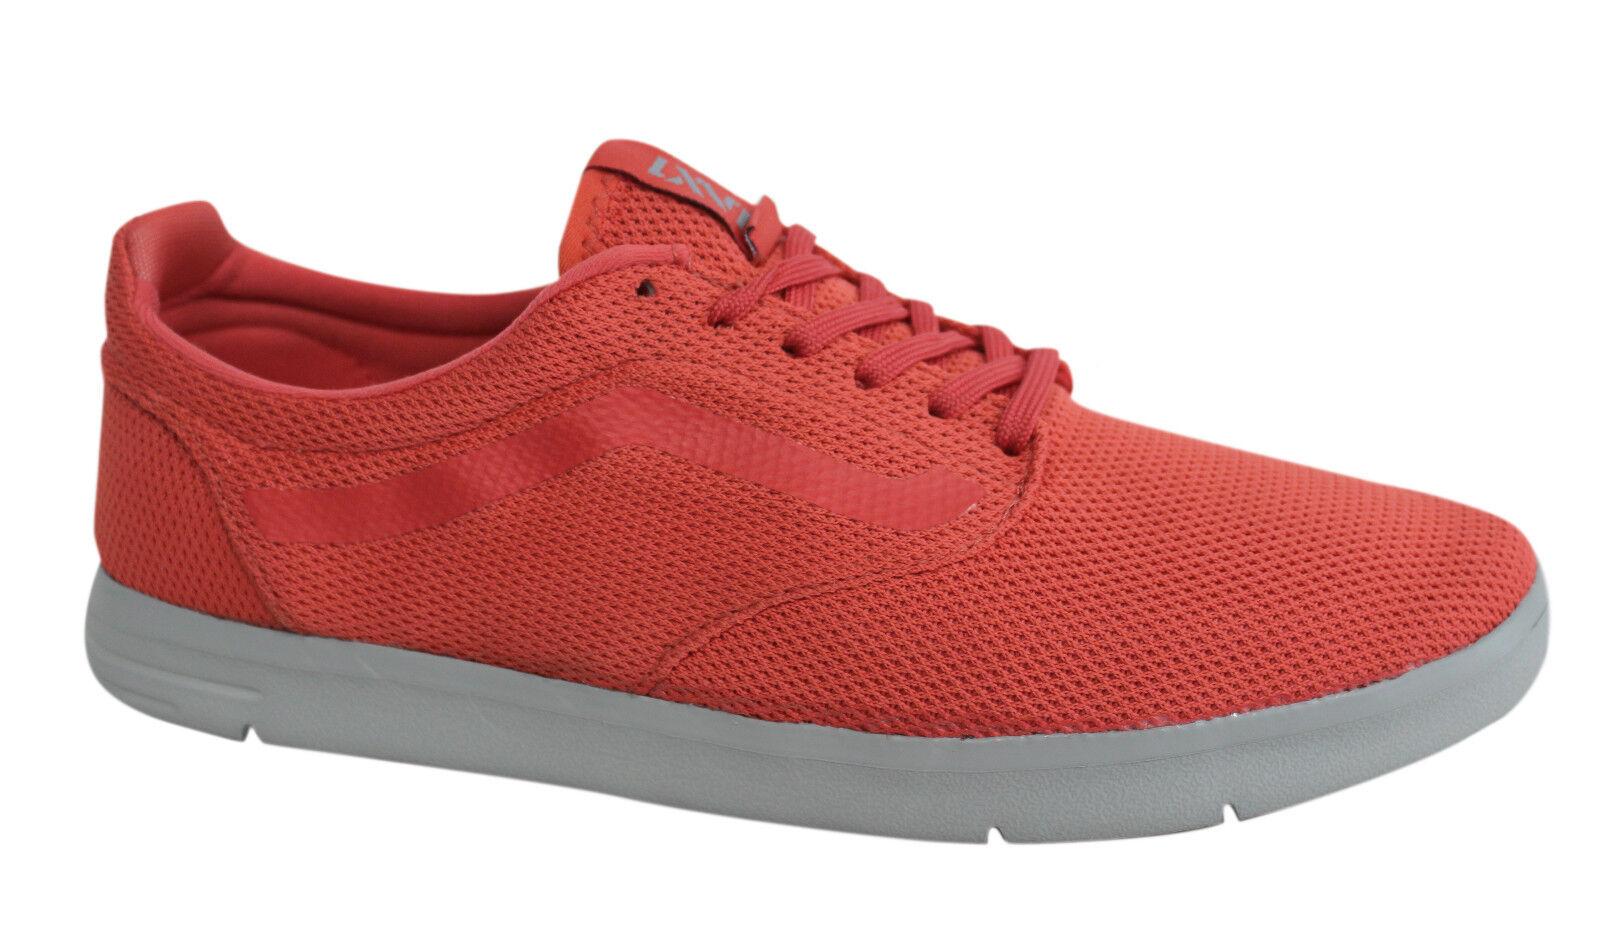 Vans Off The Wall Lacets ISO Textile Baskets à Lacets Wall Corail Rouge Chaussures vhhzu 0 Vans E 6baf26